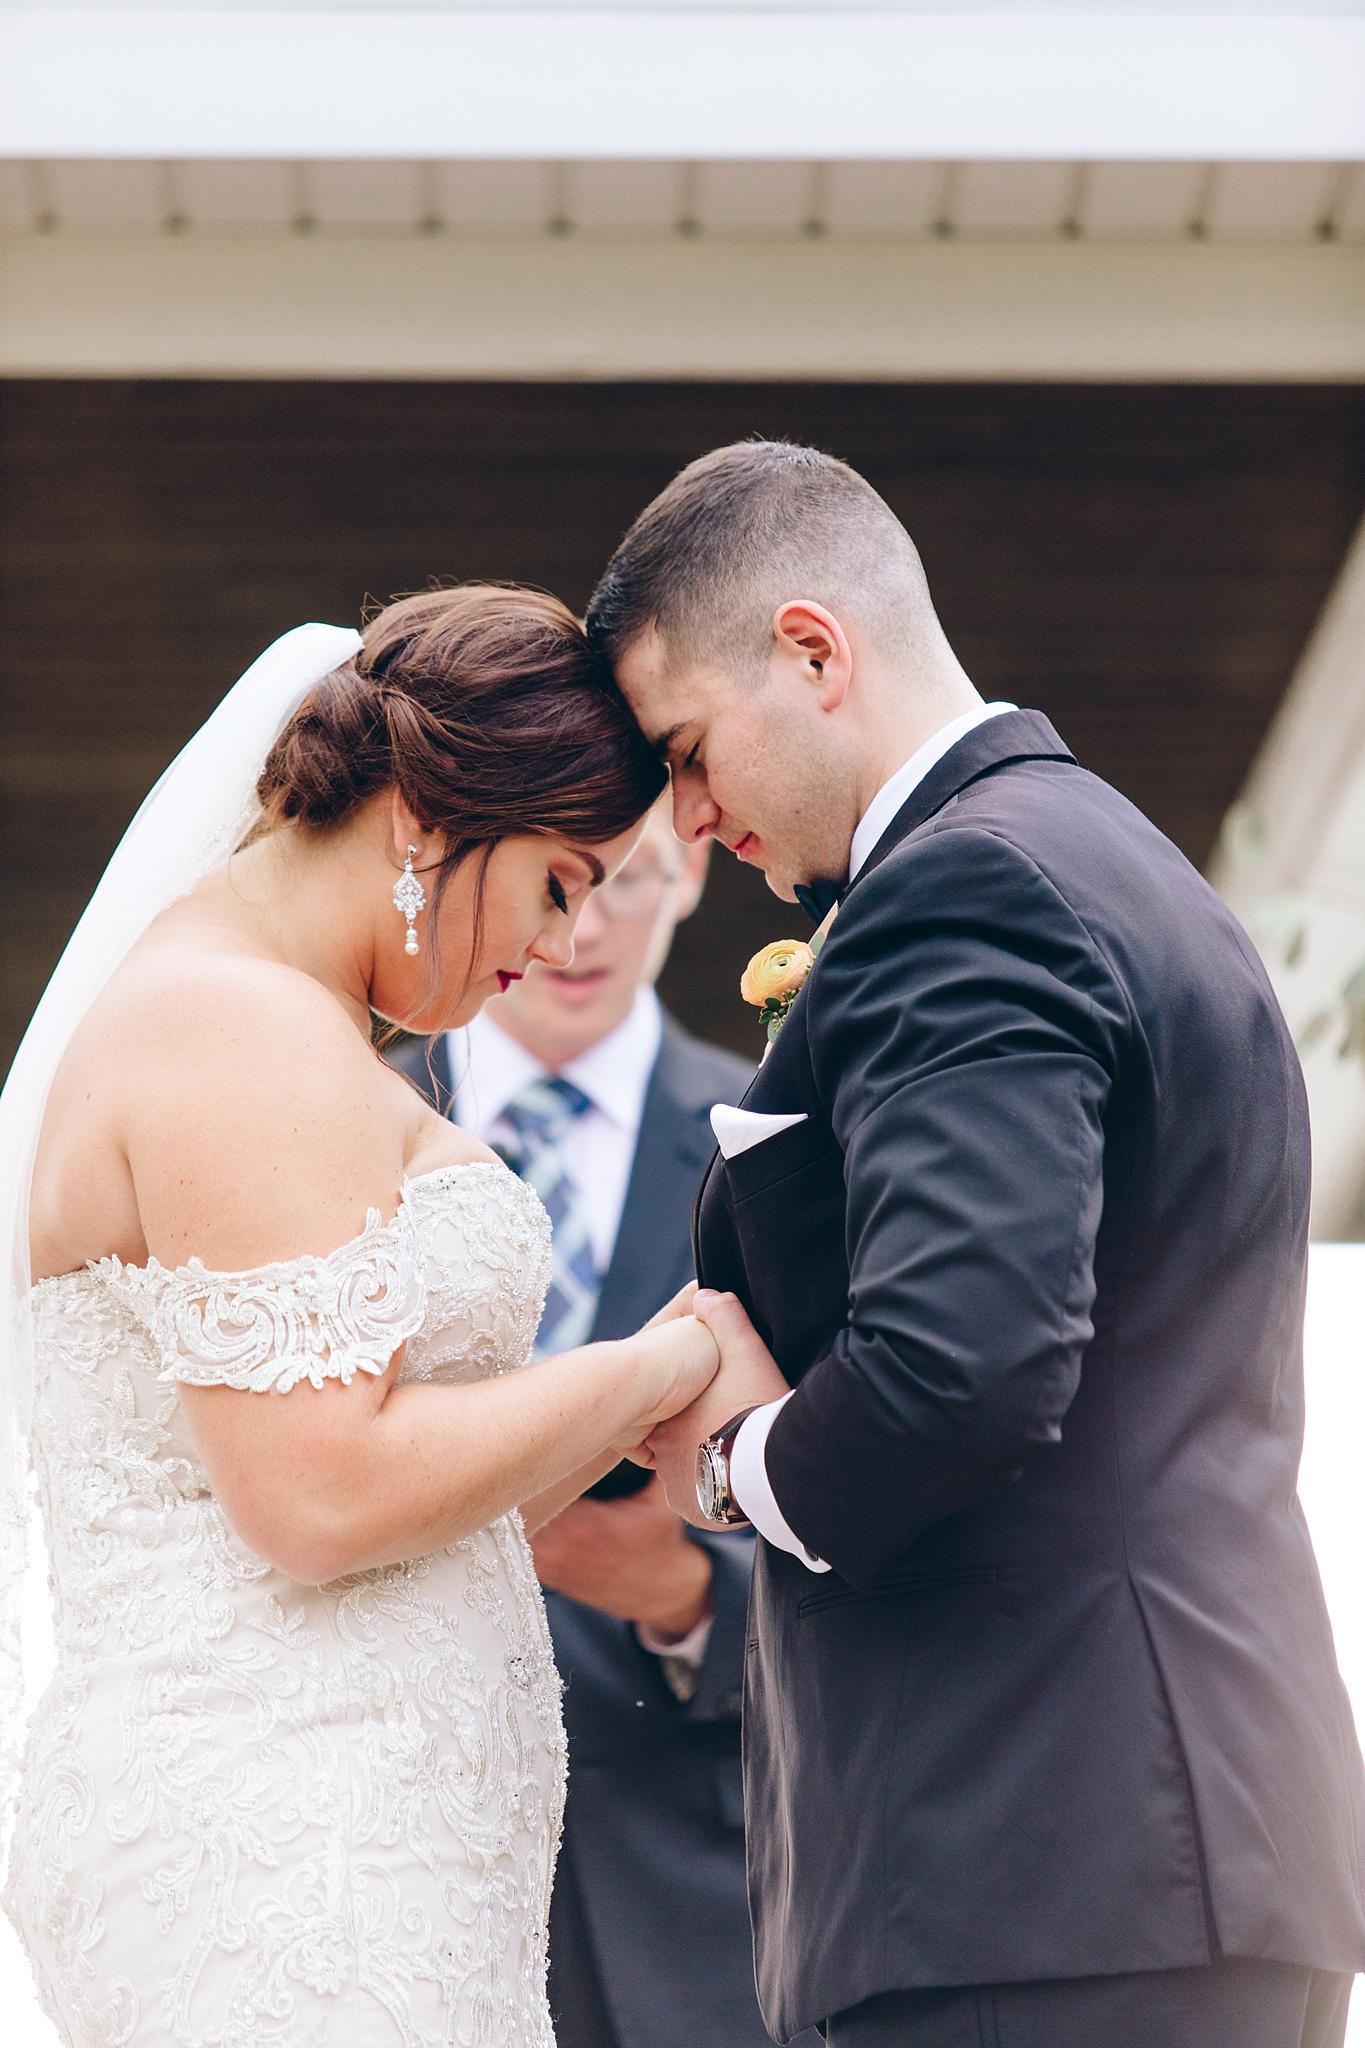 baker-lofts-holland-michigan-wedding-photographer_0358.jpg